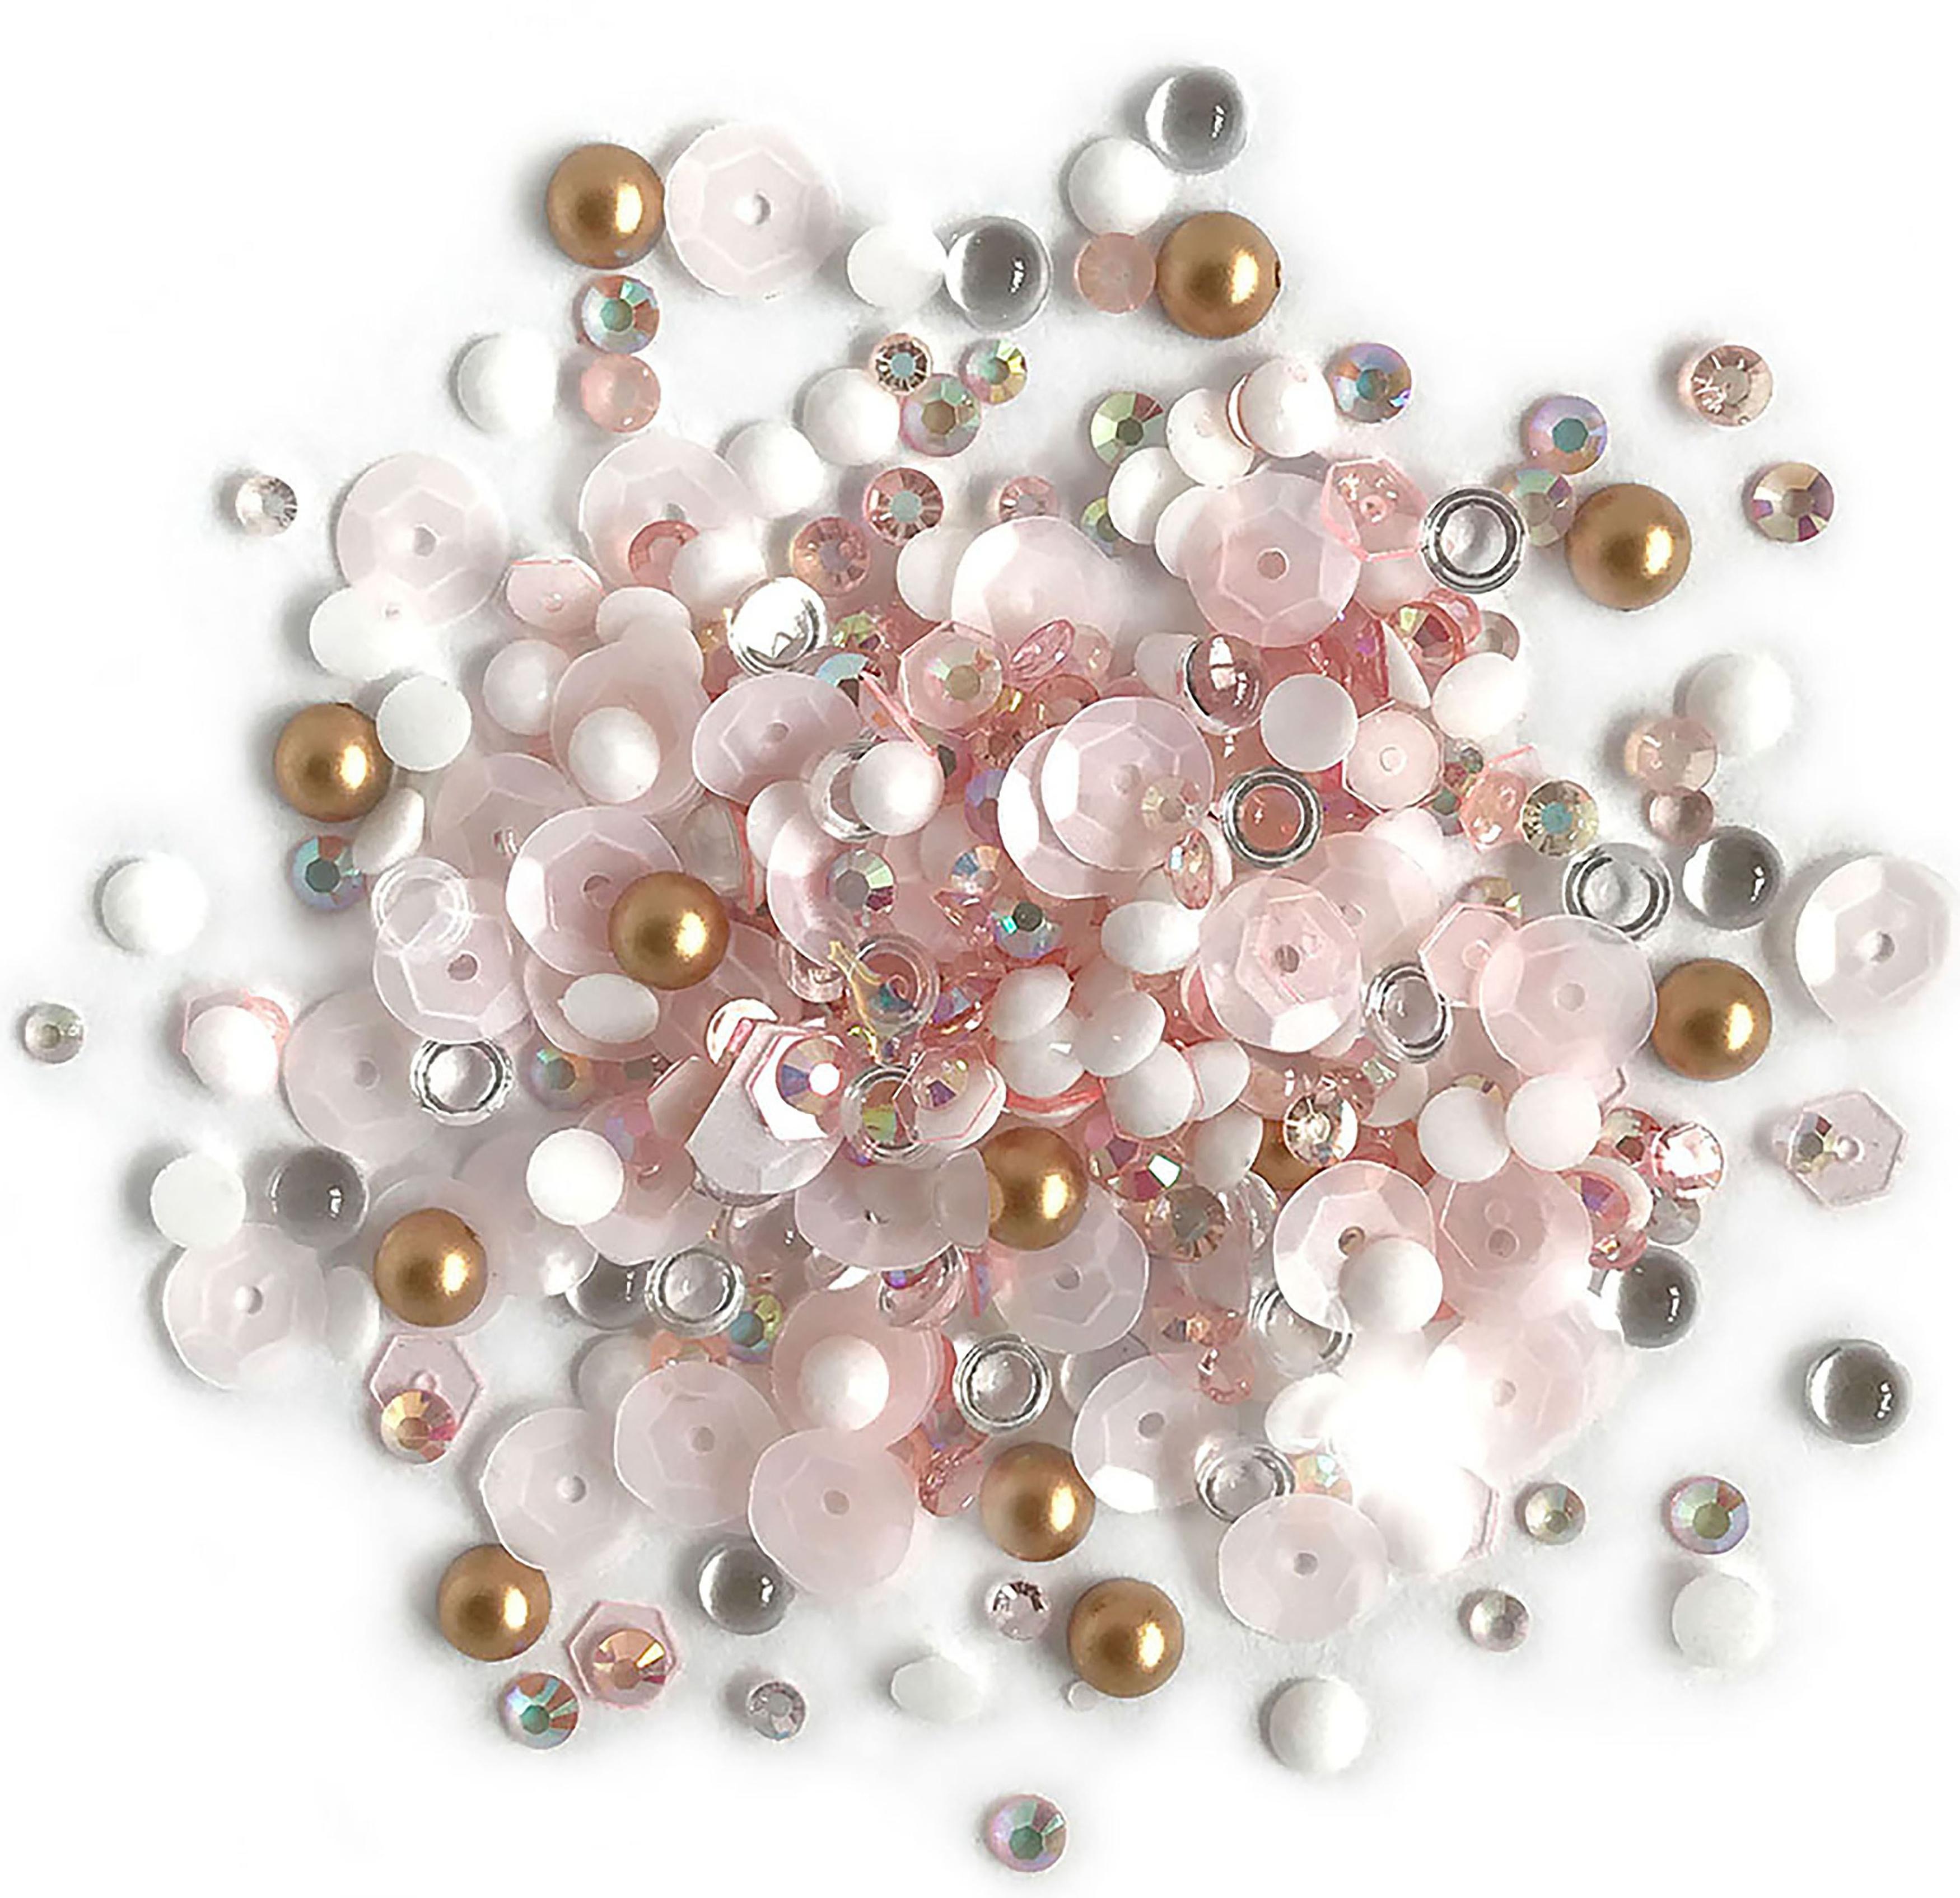 Sparkletz Embellishment Pack 10g-Coral Coast